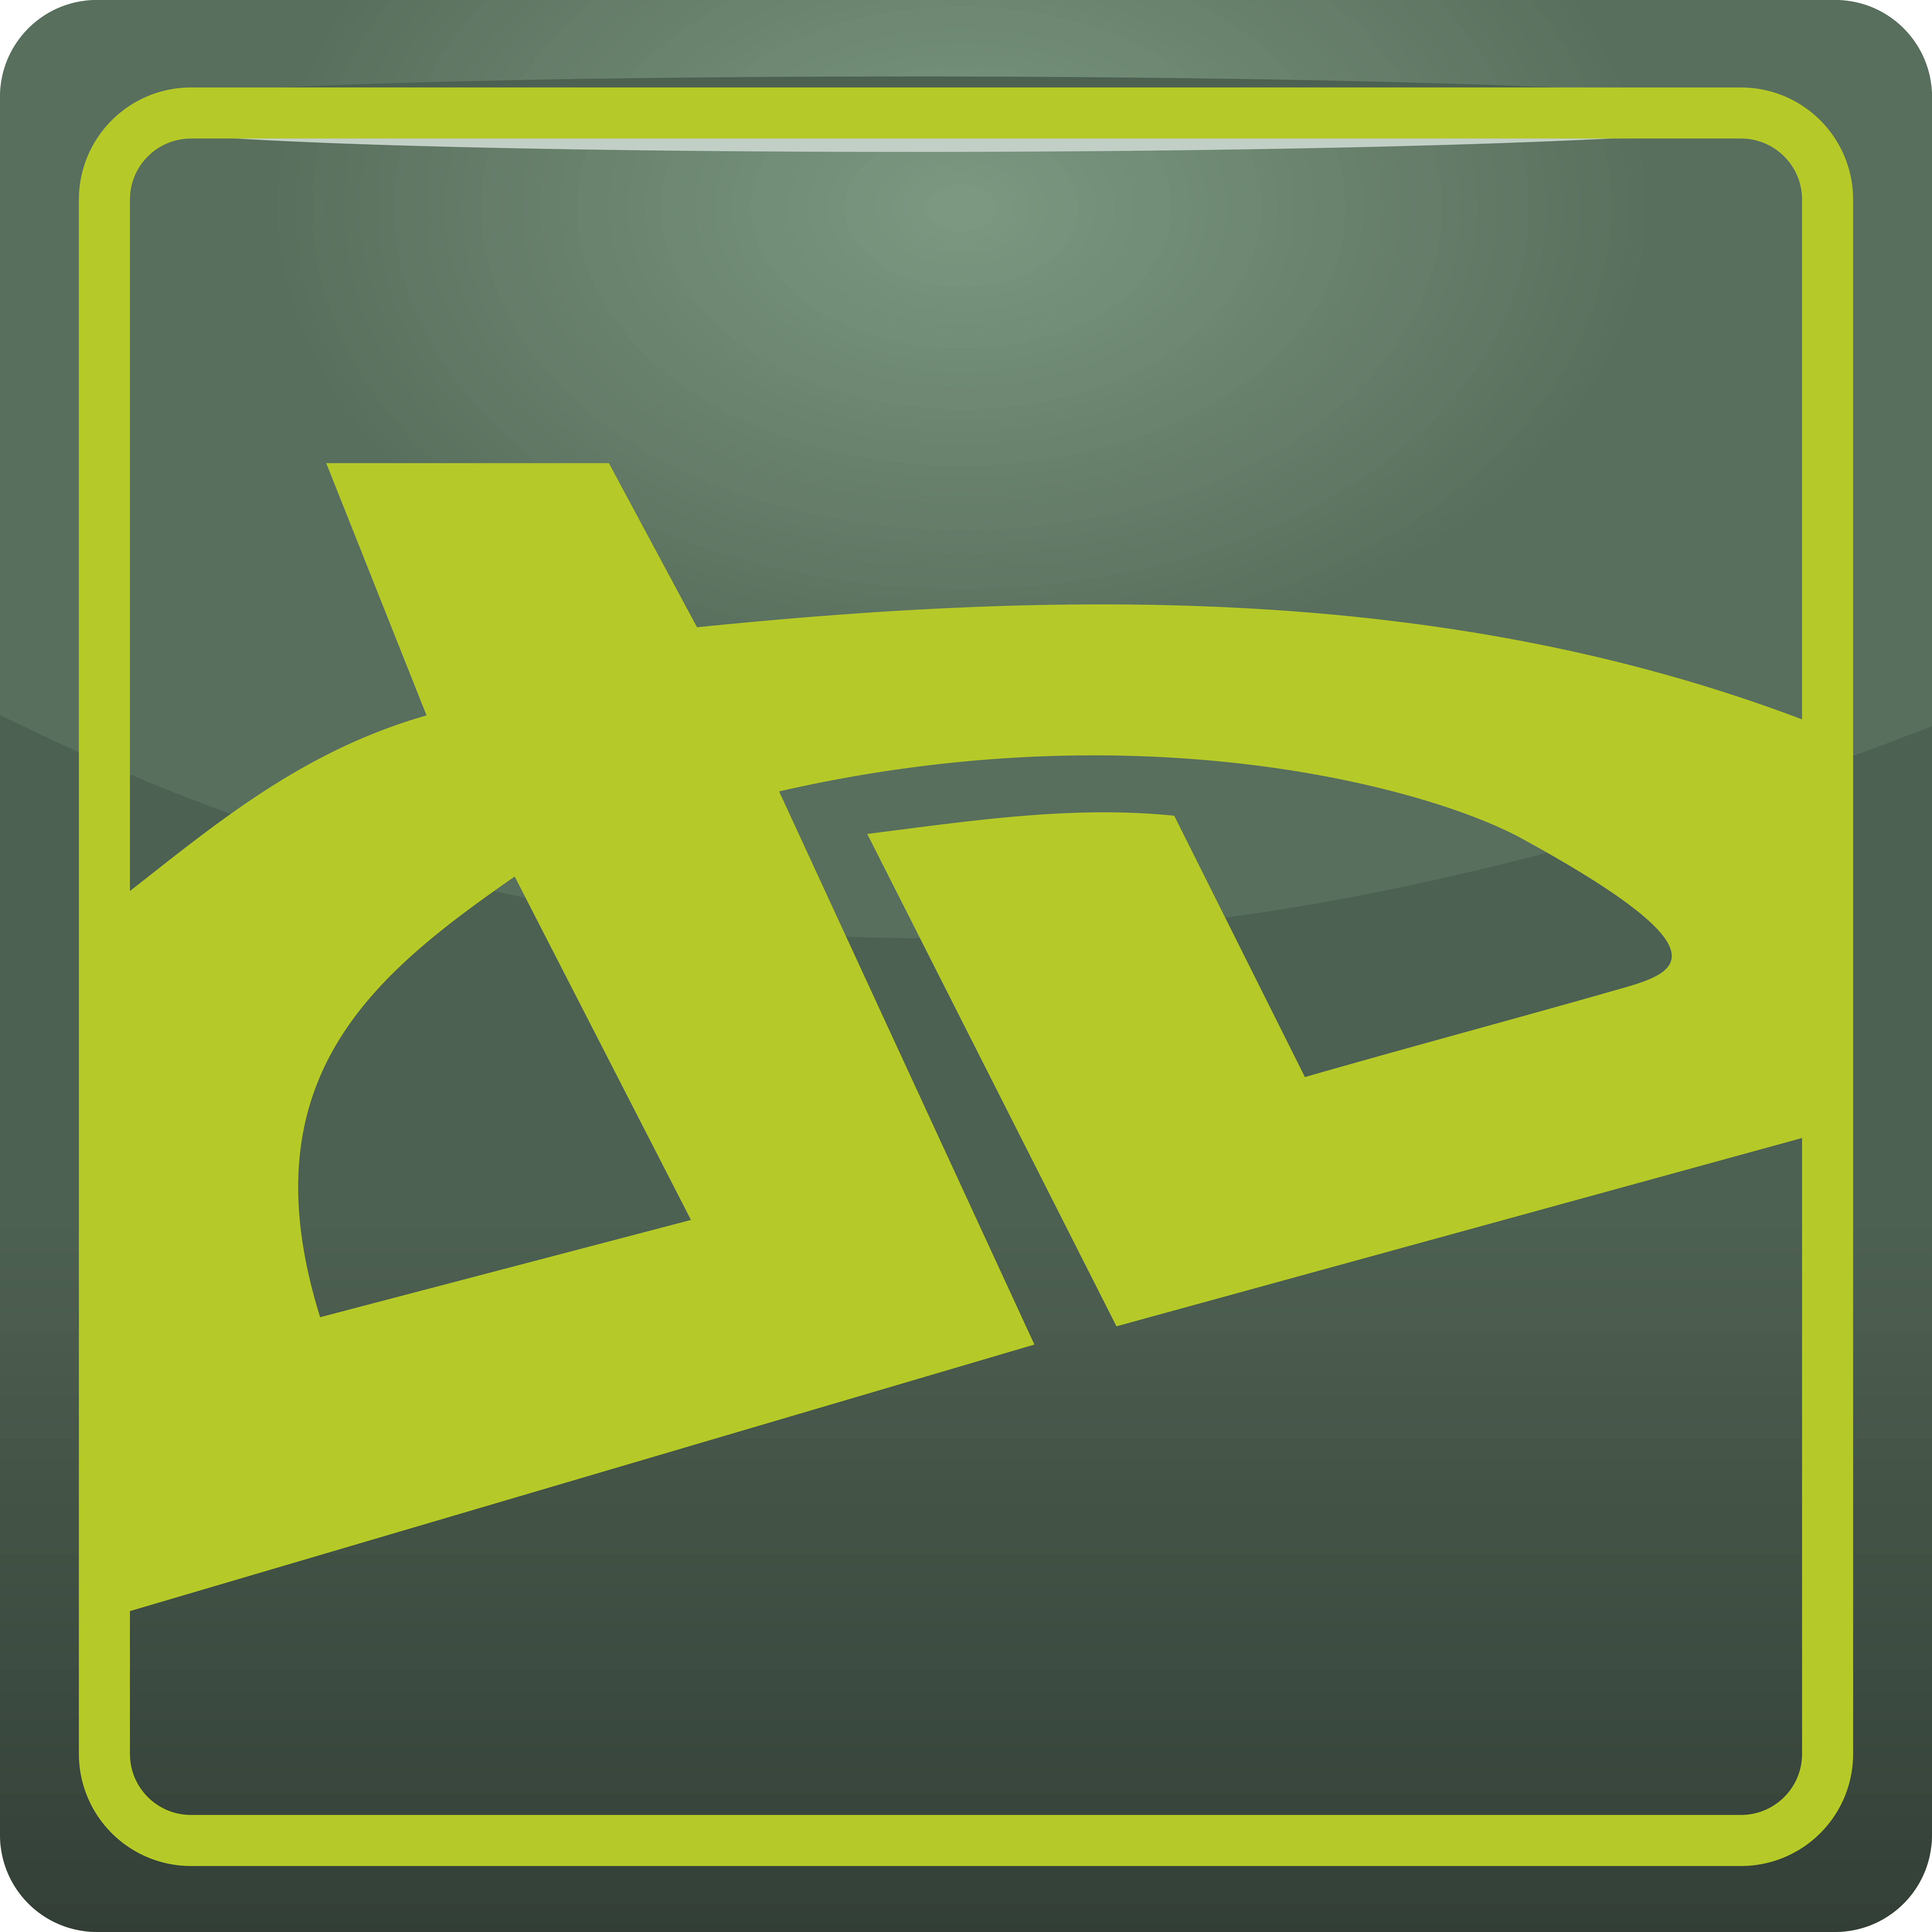 deviantart_logo_by_lonmcgregor-d6altc0.p